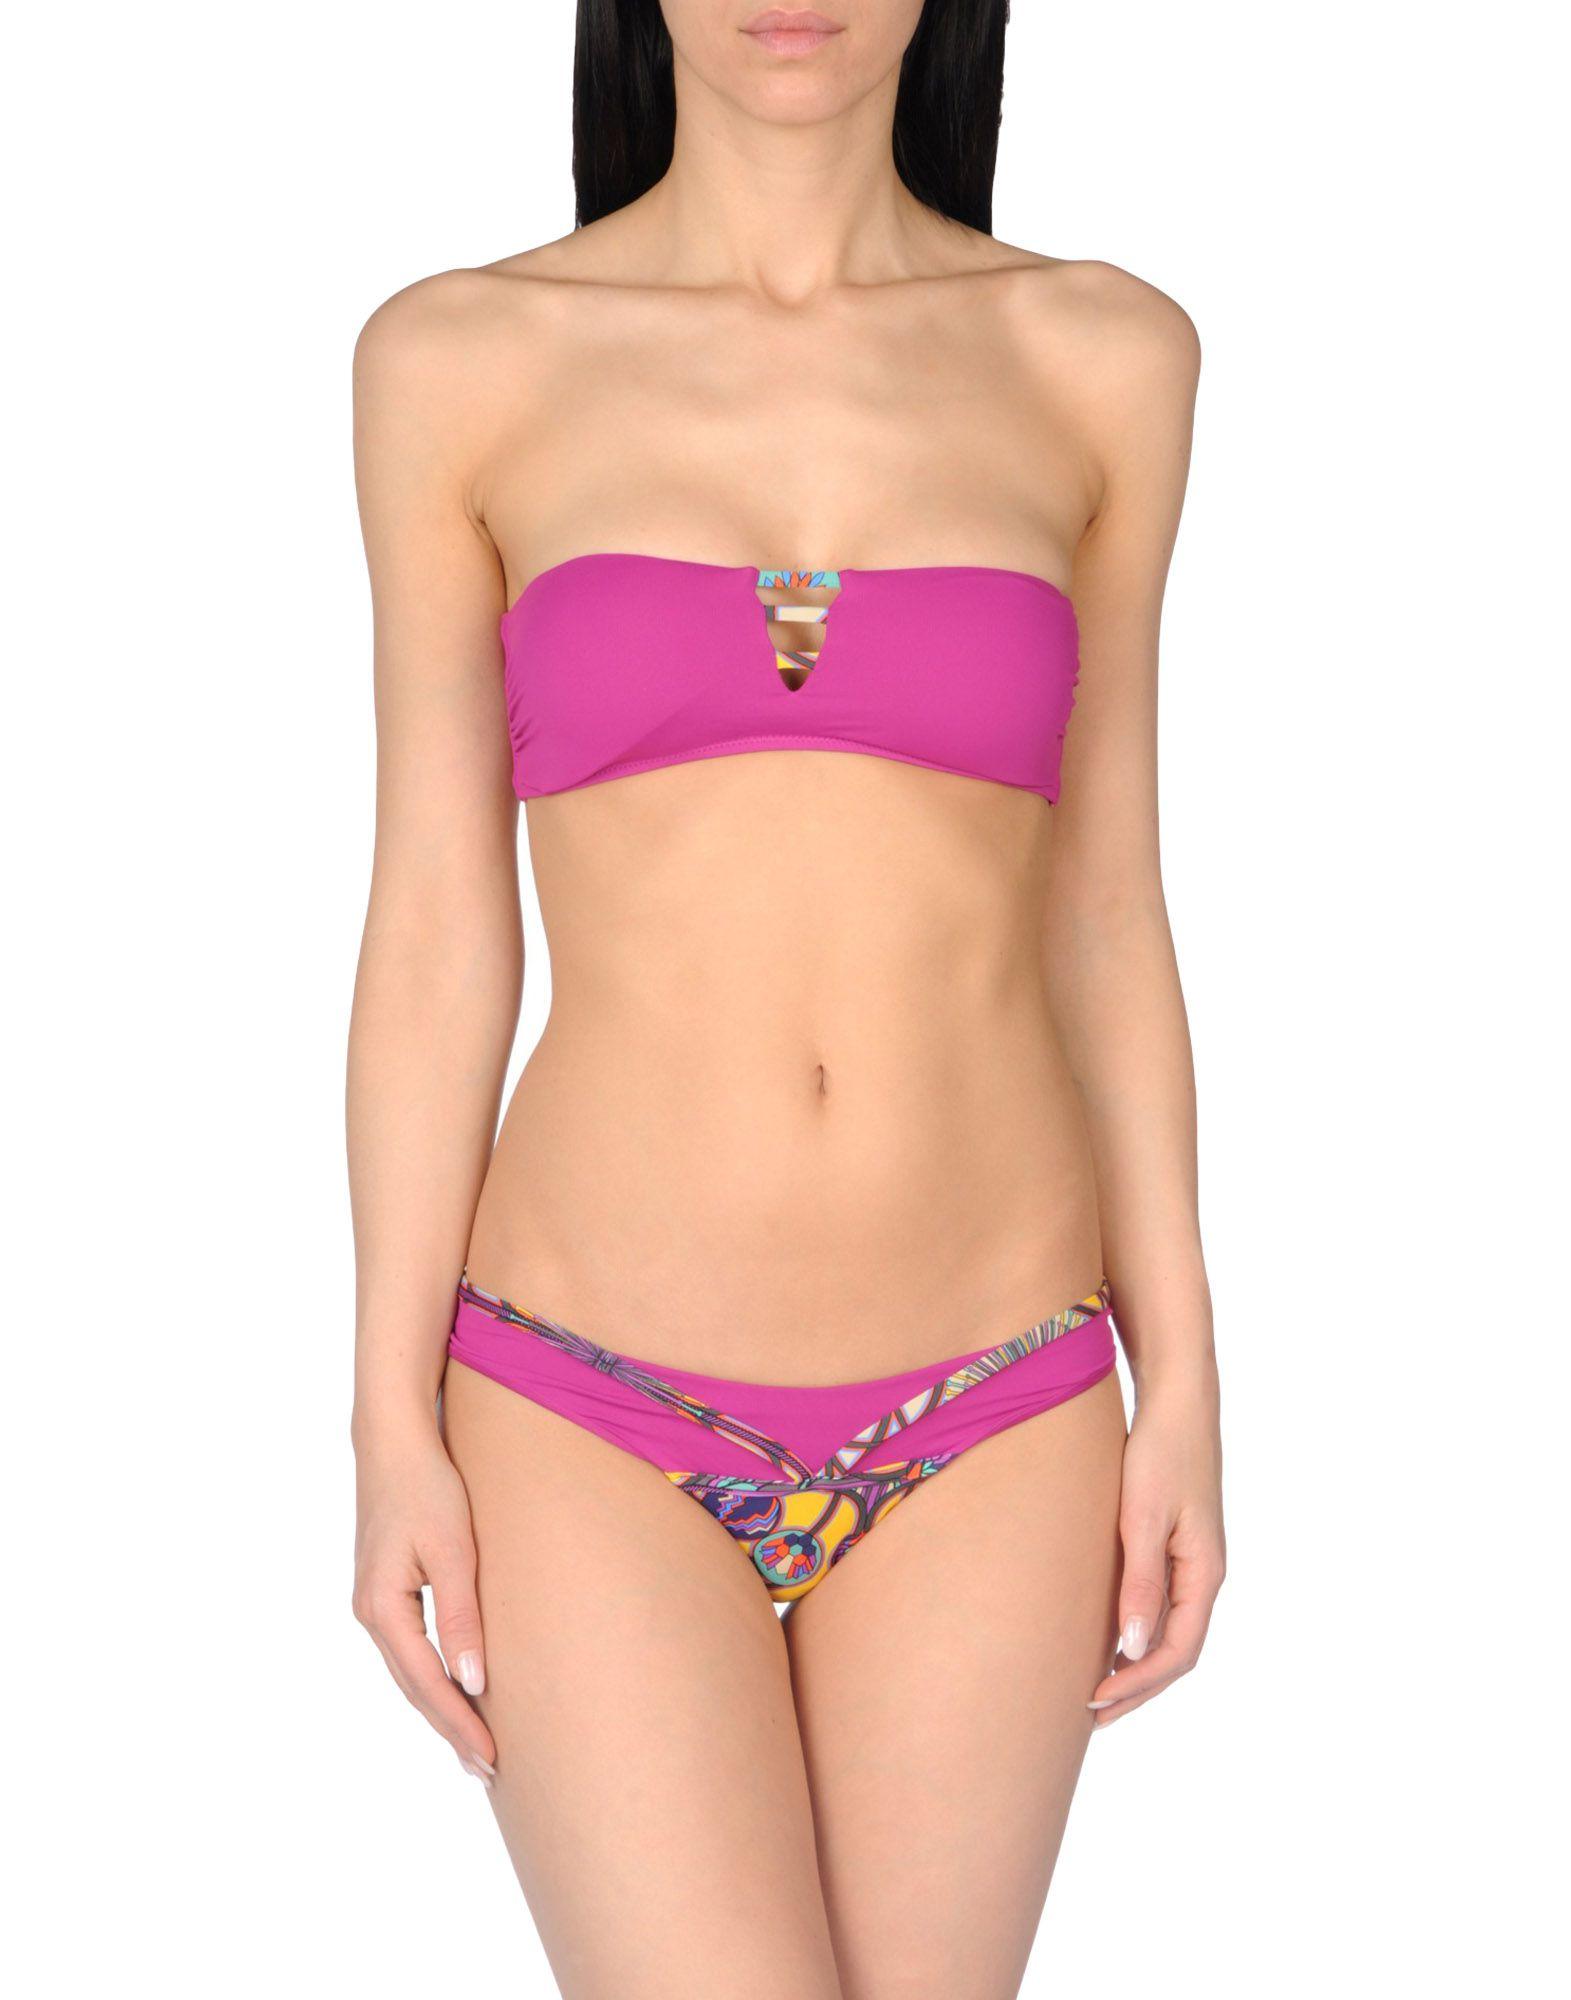 MISS BIKINI LUXE Бикини bikini set 2017 summer swimwear biquini women sexy beach swimsuit bathing suit brazilian bikini with halter strap